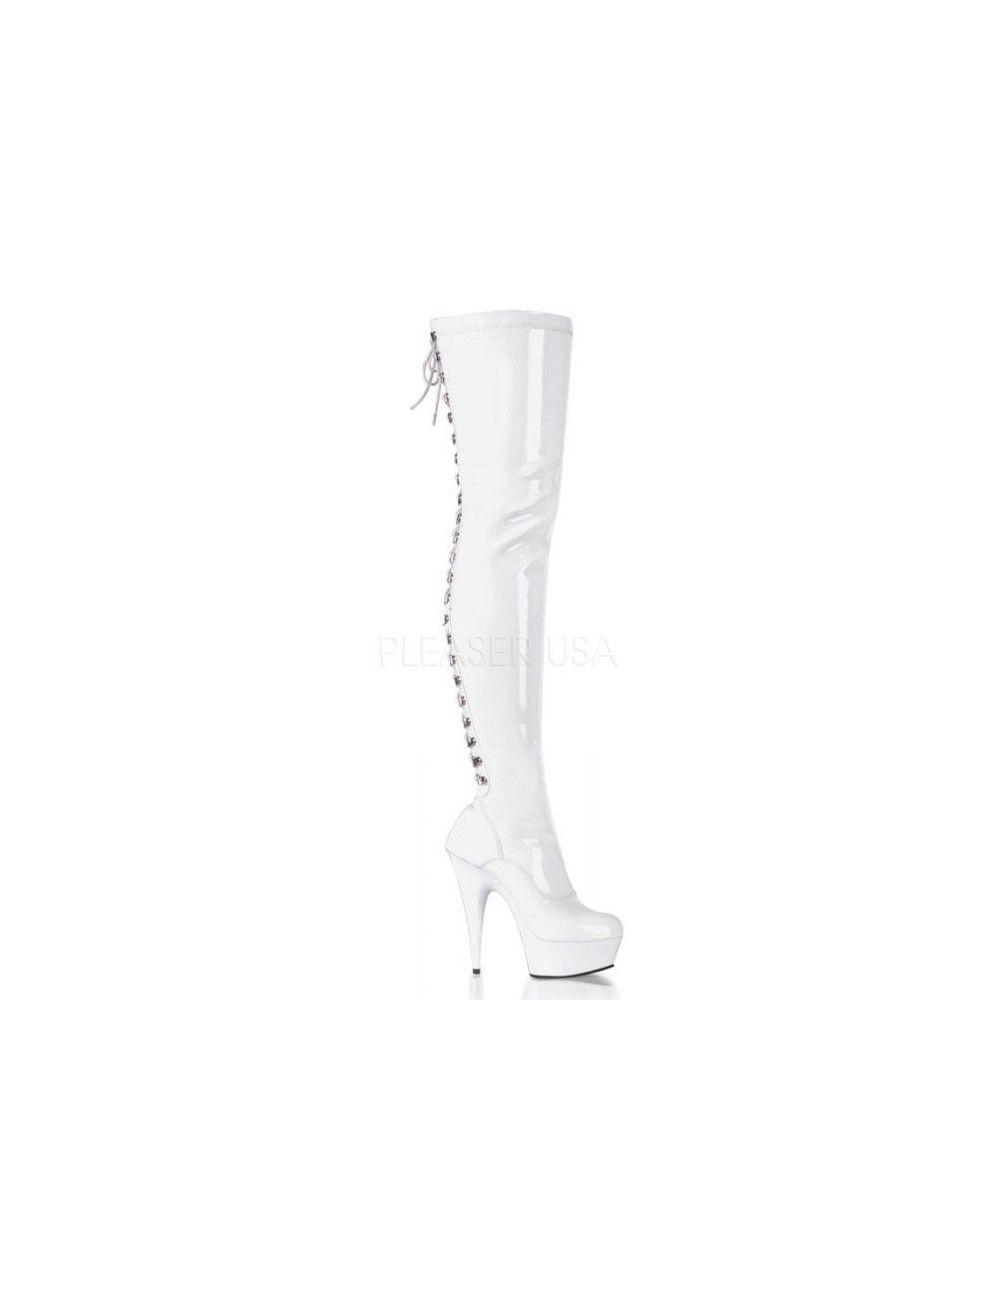 Cuissardes plateforme sexy laçage Blanc Vernis PLEASER